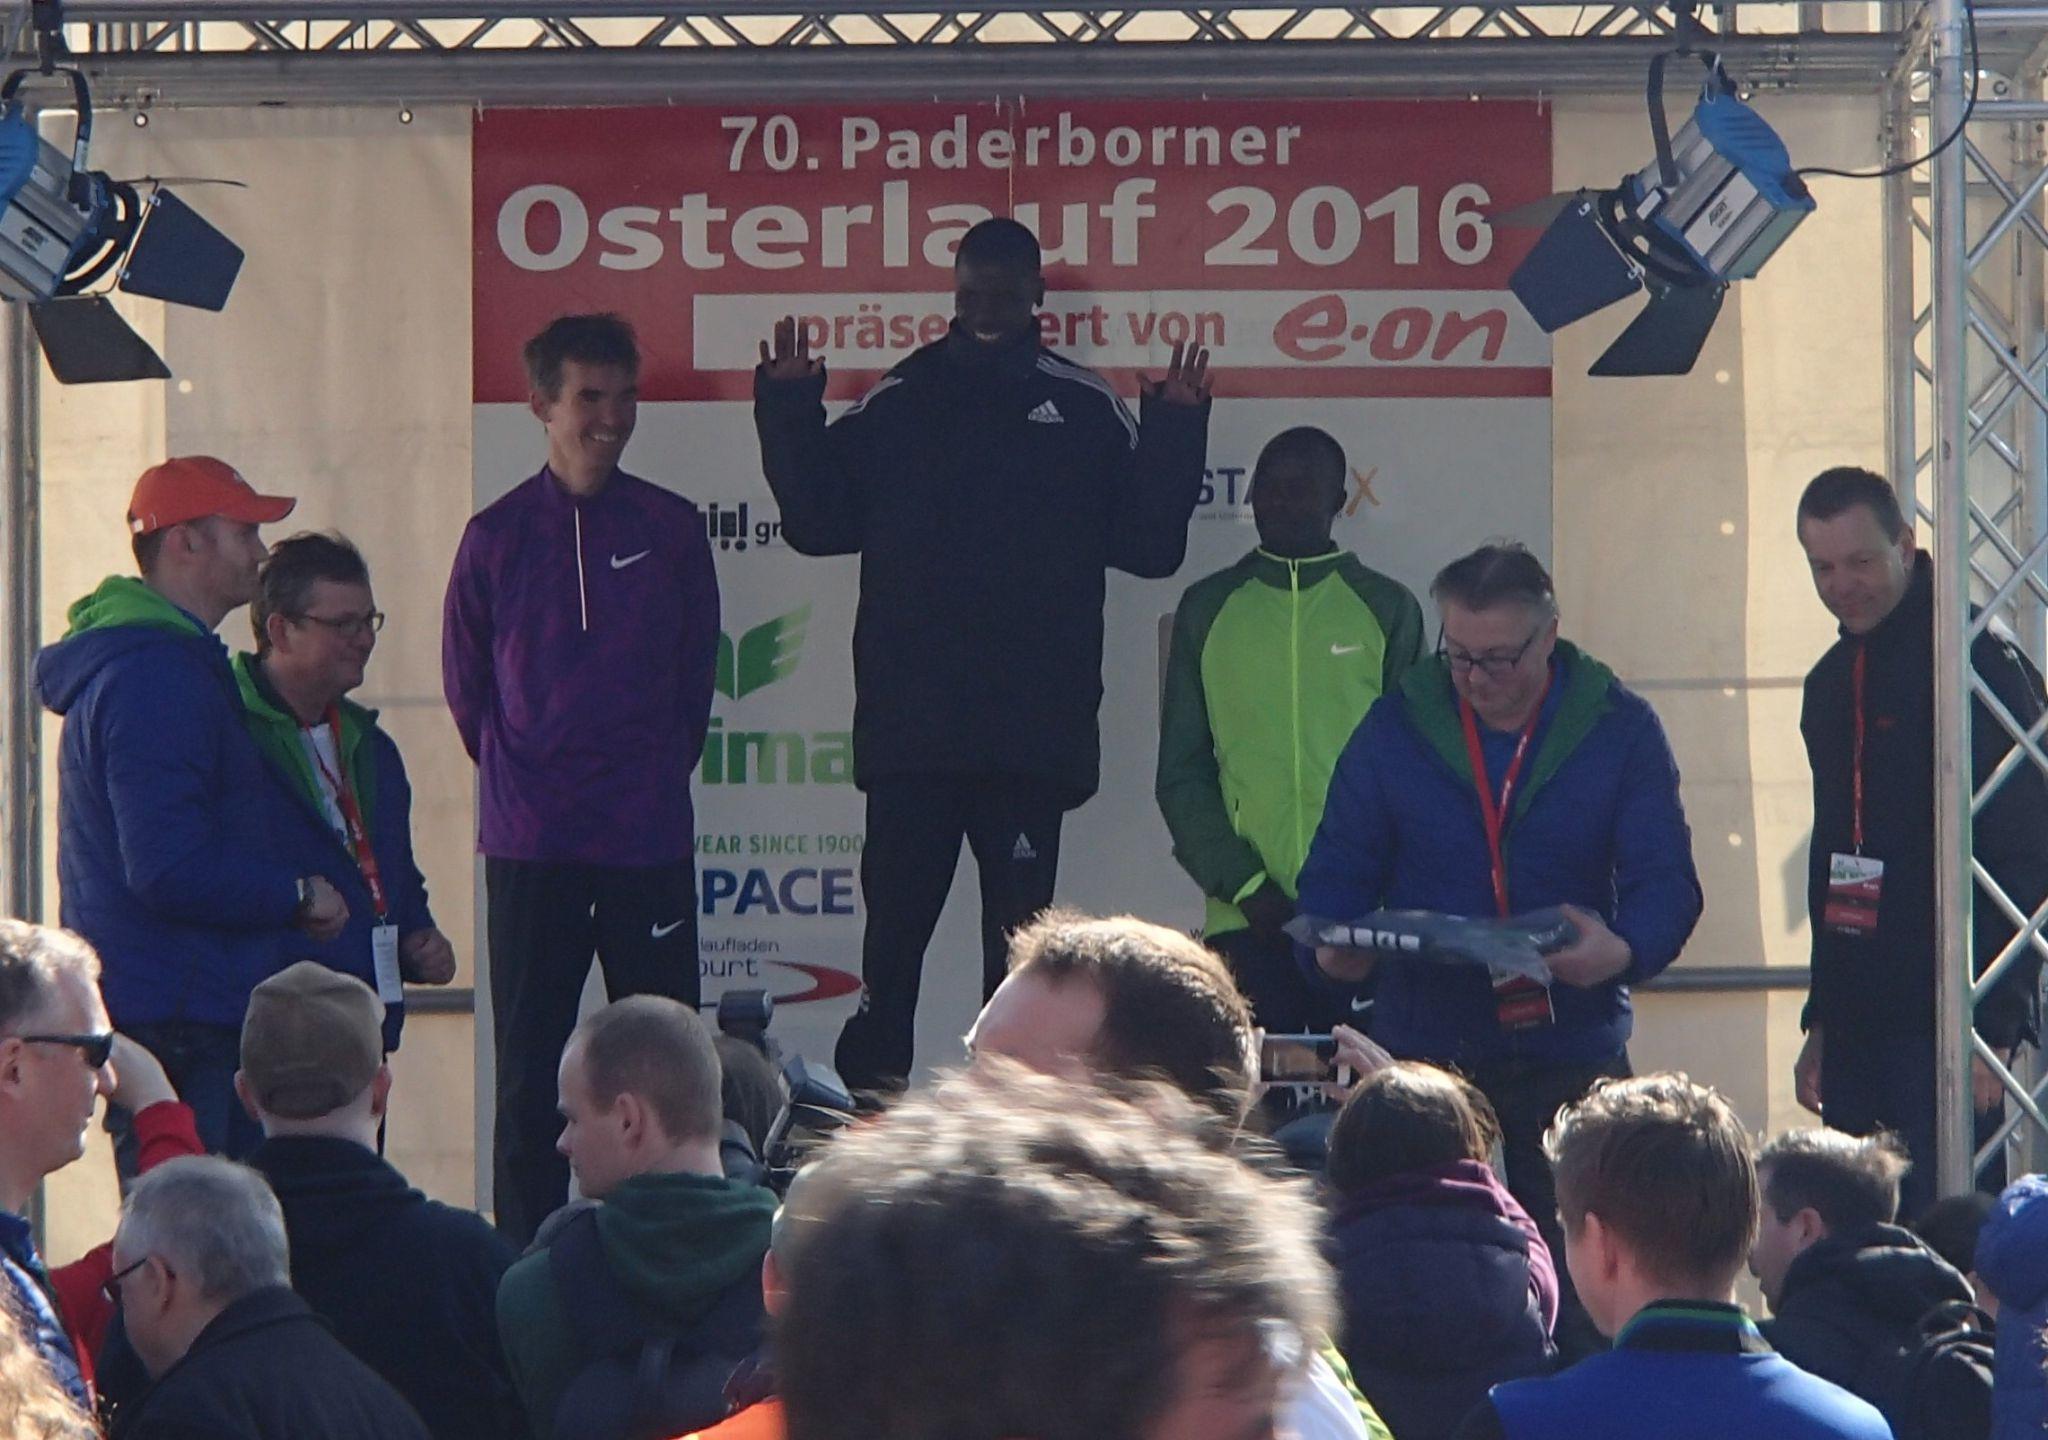 Osterlauf Paderborn 2